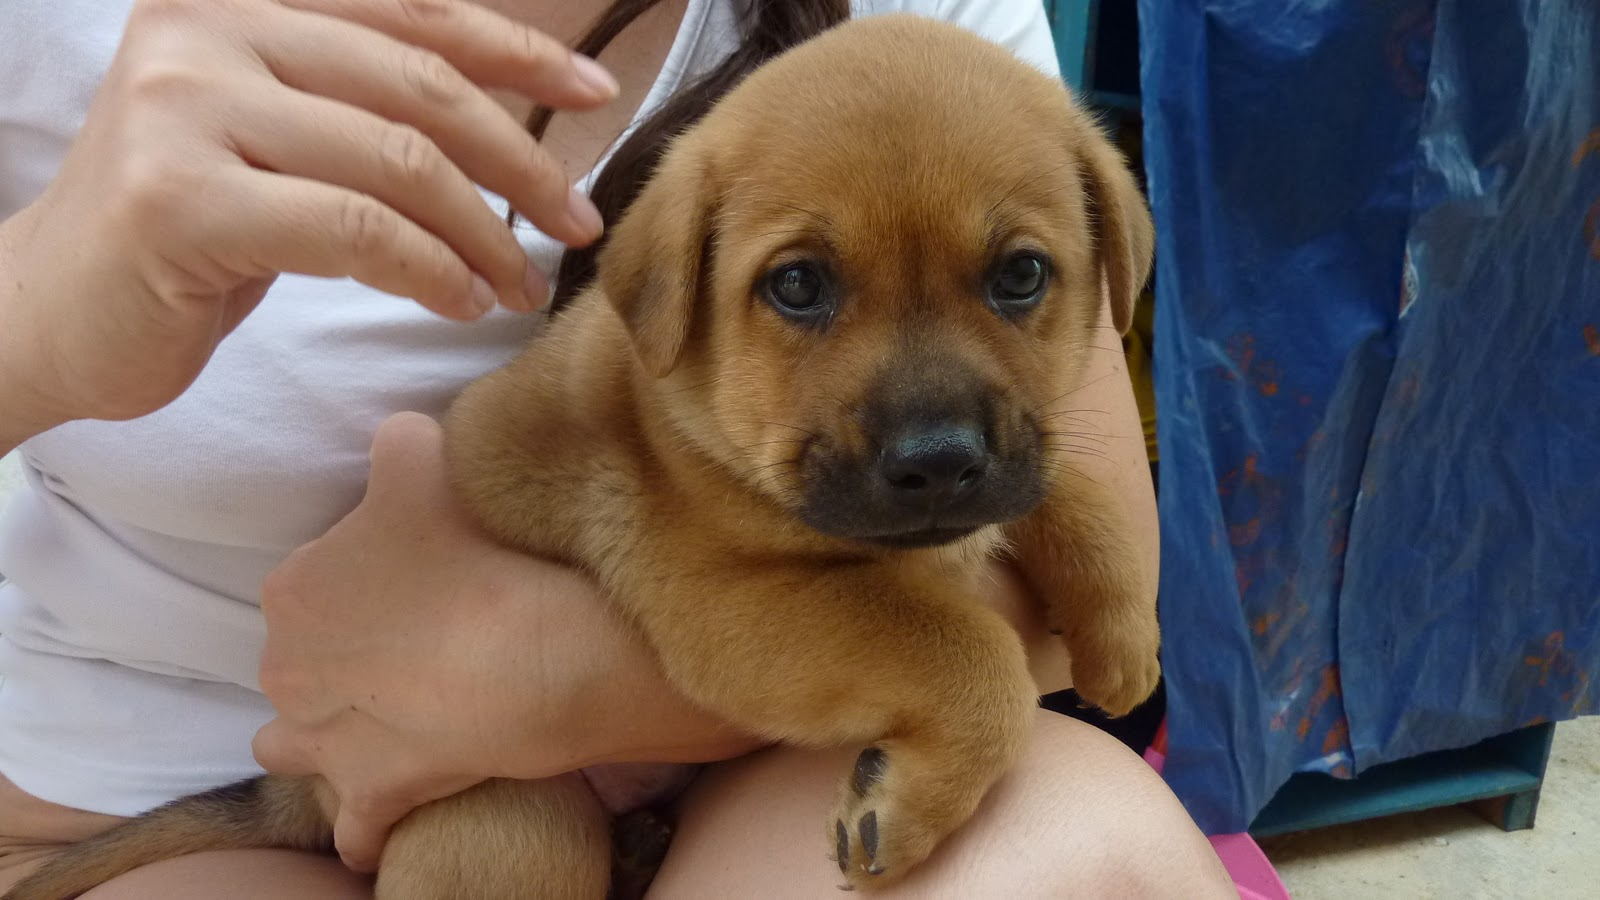 PetuniaLee™: Mongrel Puppies Need a Home Дворняжка Щенок